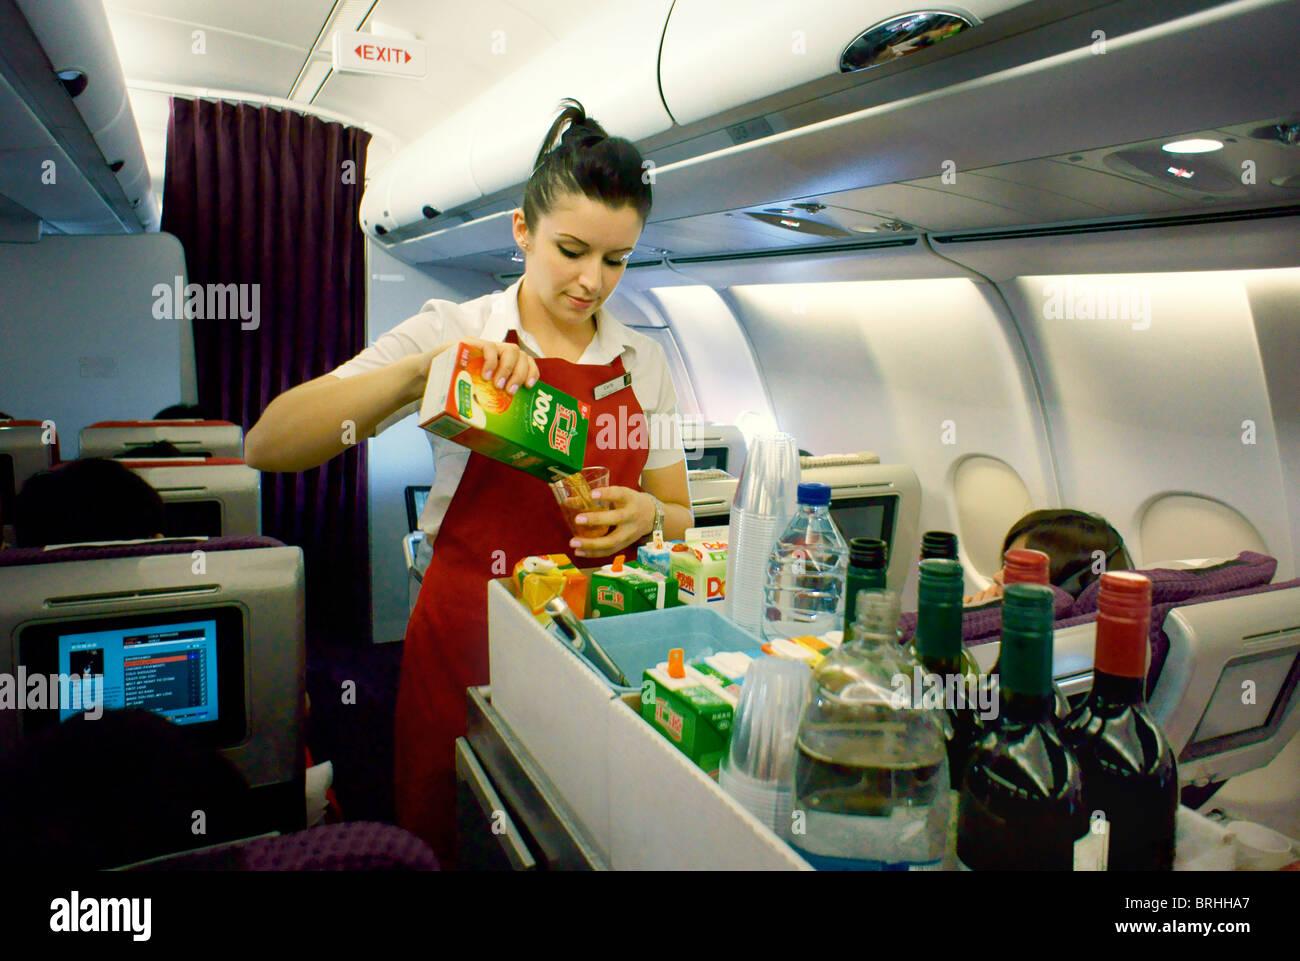 Langstrecken Flug Air Stewardess mit Lebensmittel Getränke Gang Wagen auf Übernachtung Virgin Atlantic Stockbild